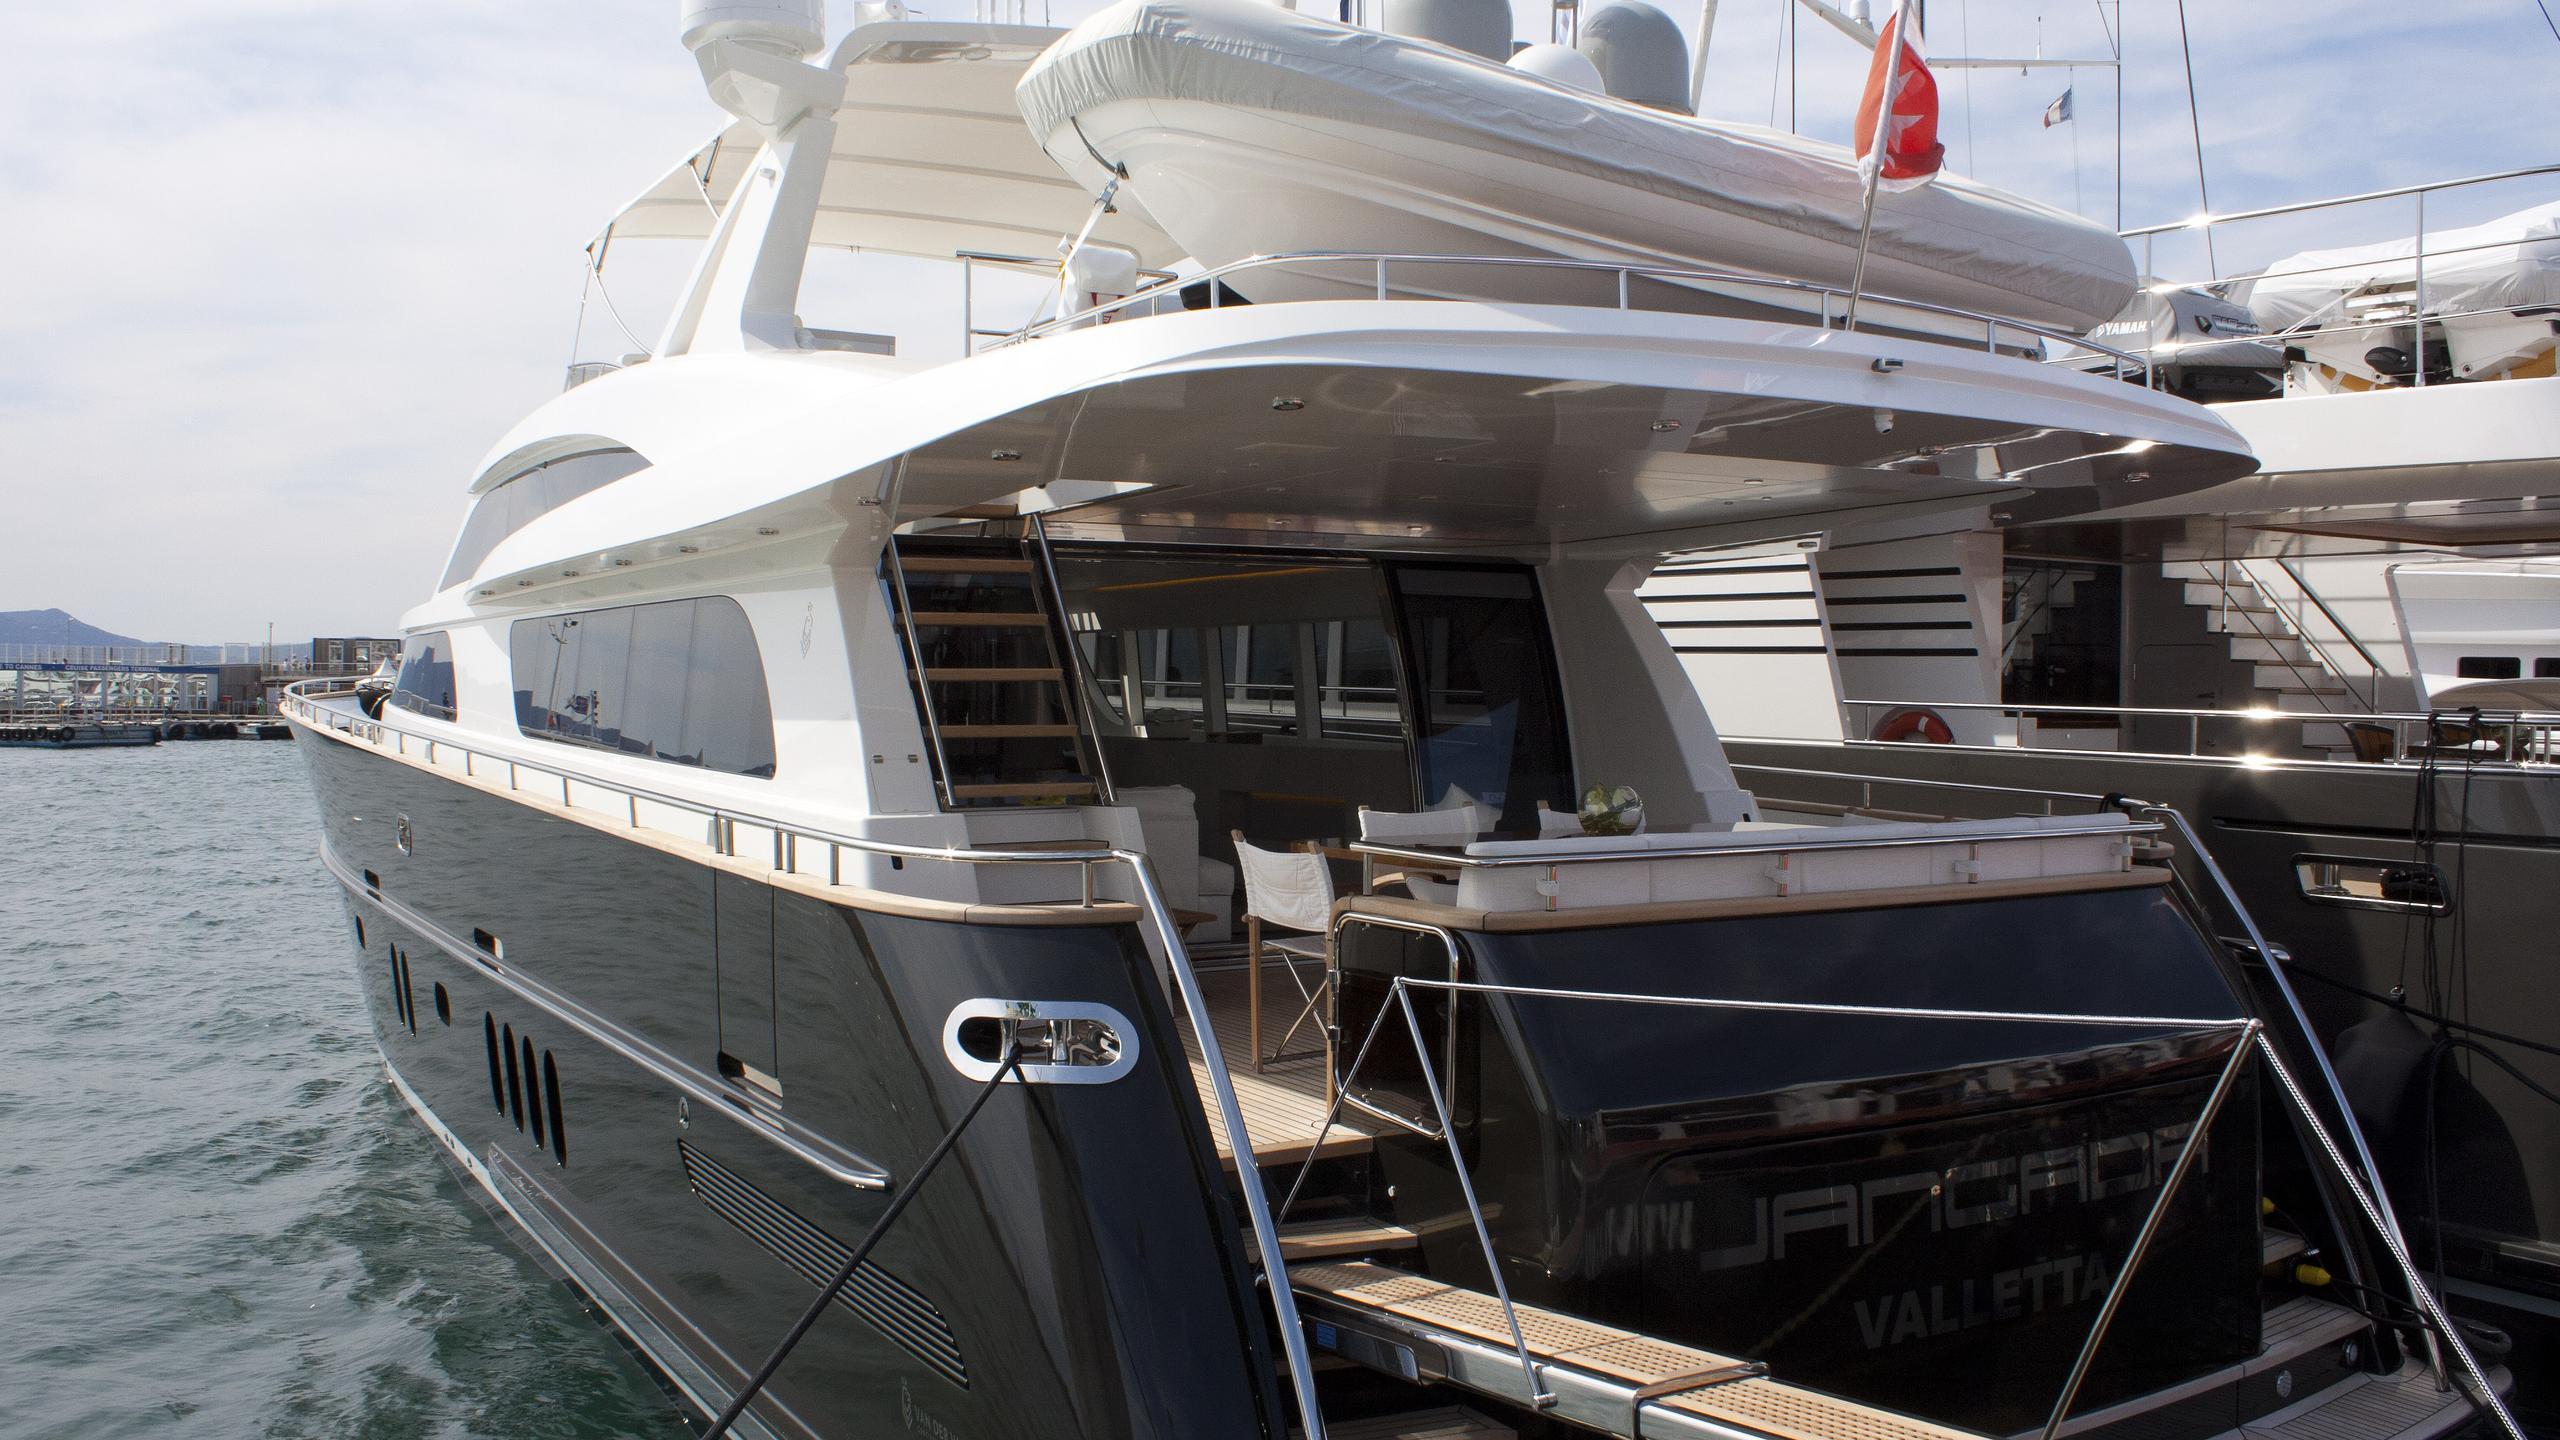 jangada-motor-yacht-van-der-valk-continental-iii-2015-25m-stern